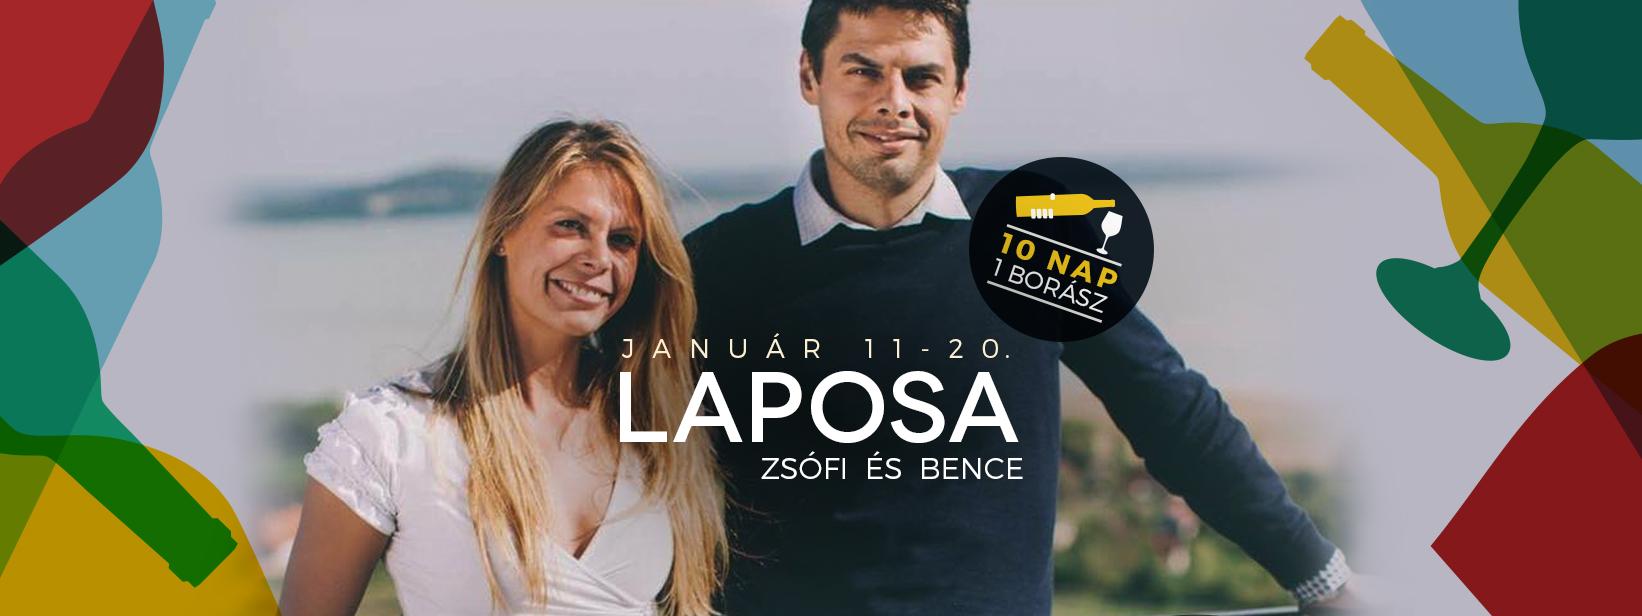 laposa_cover_2_b.jpg